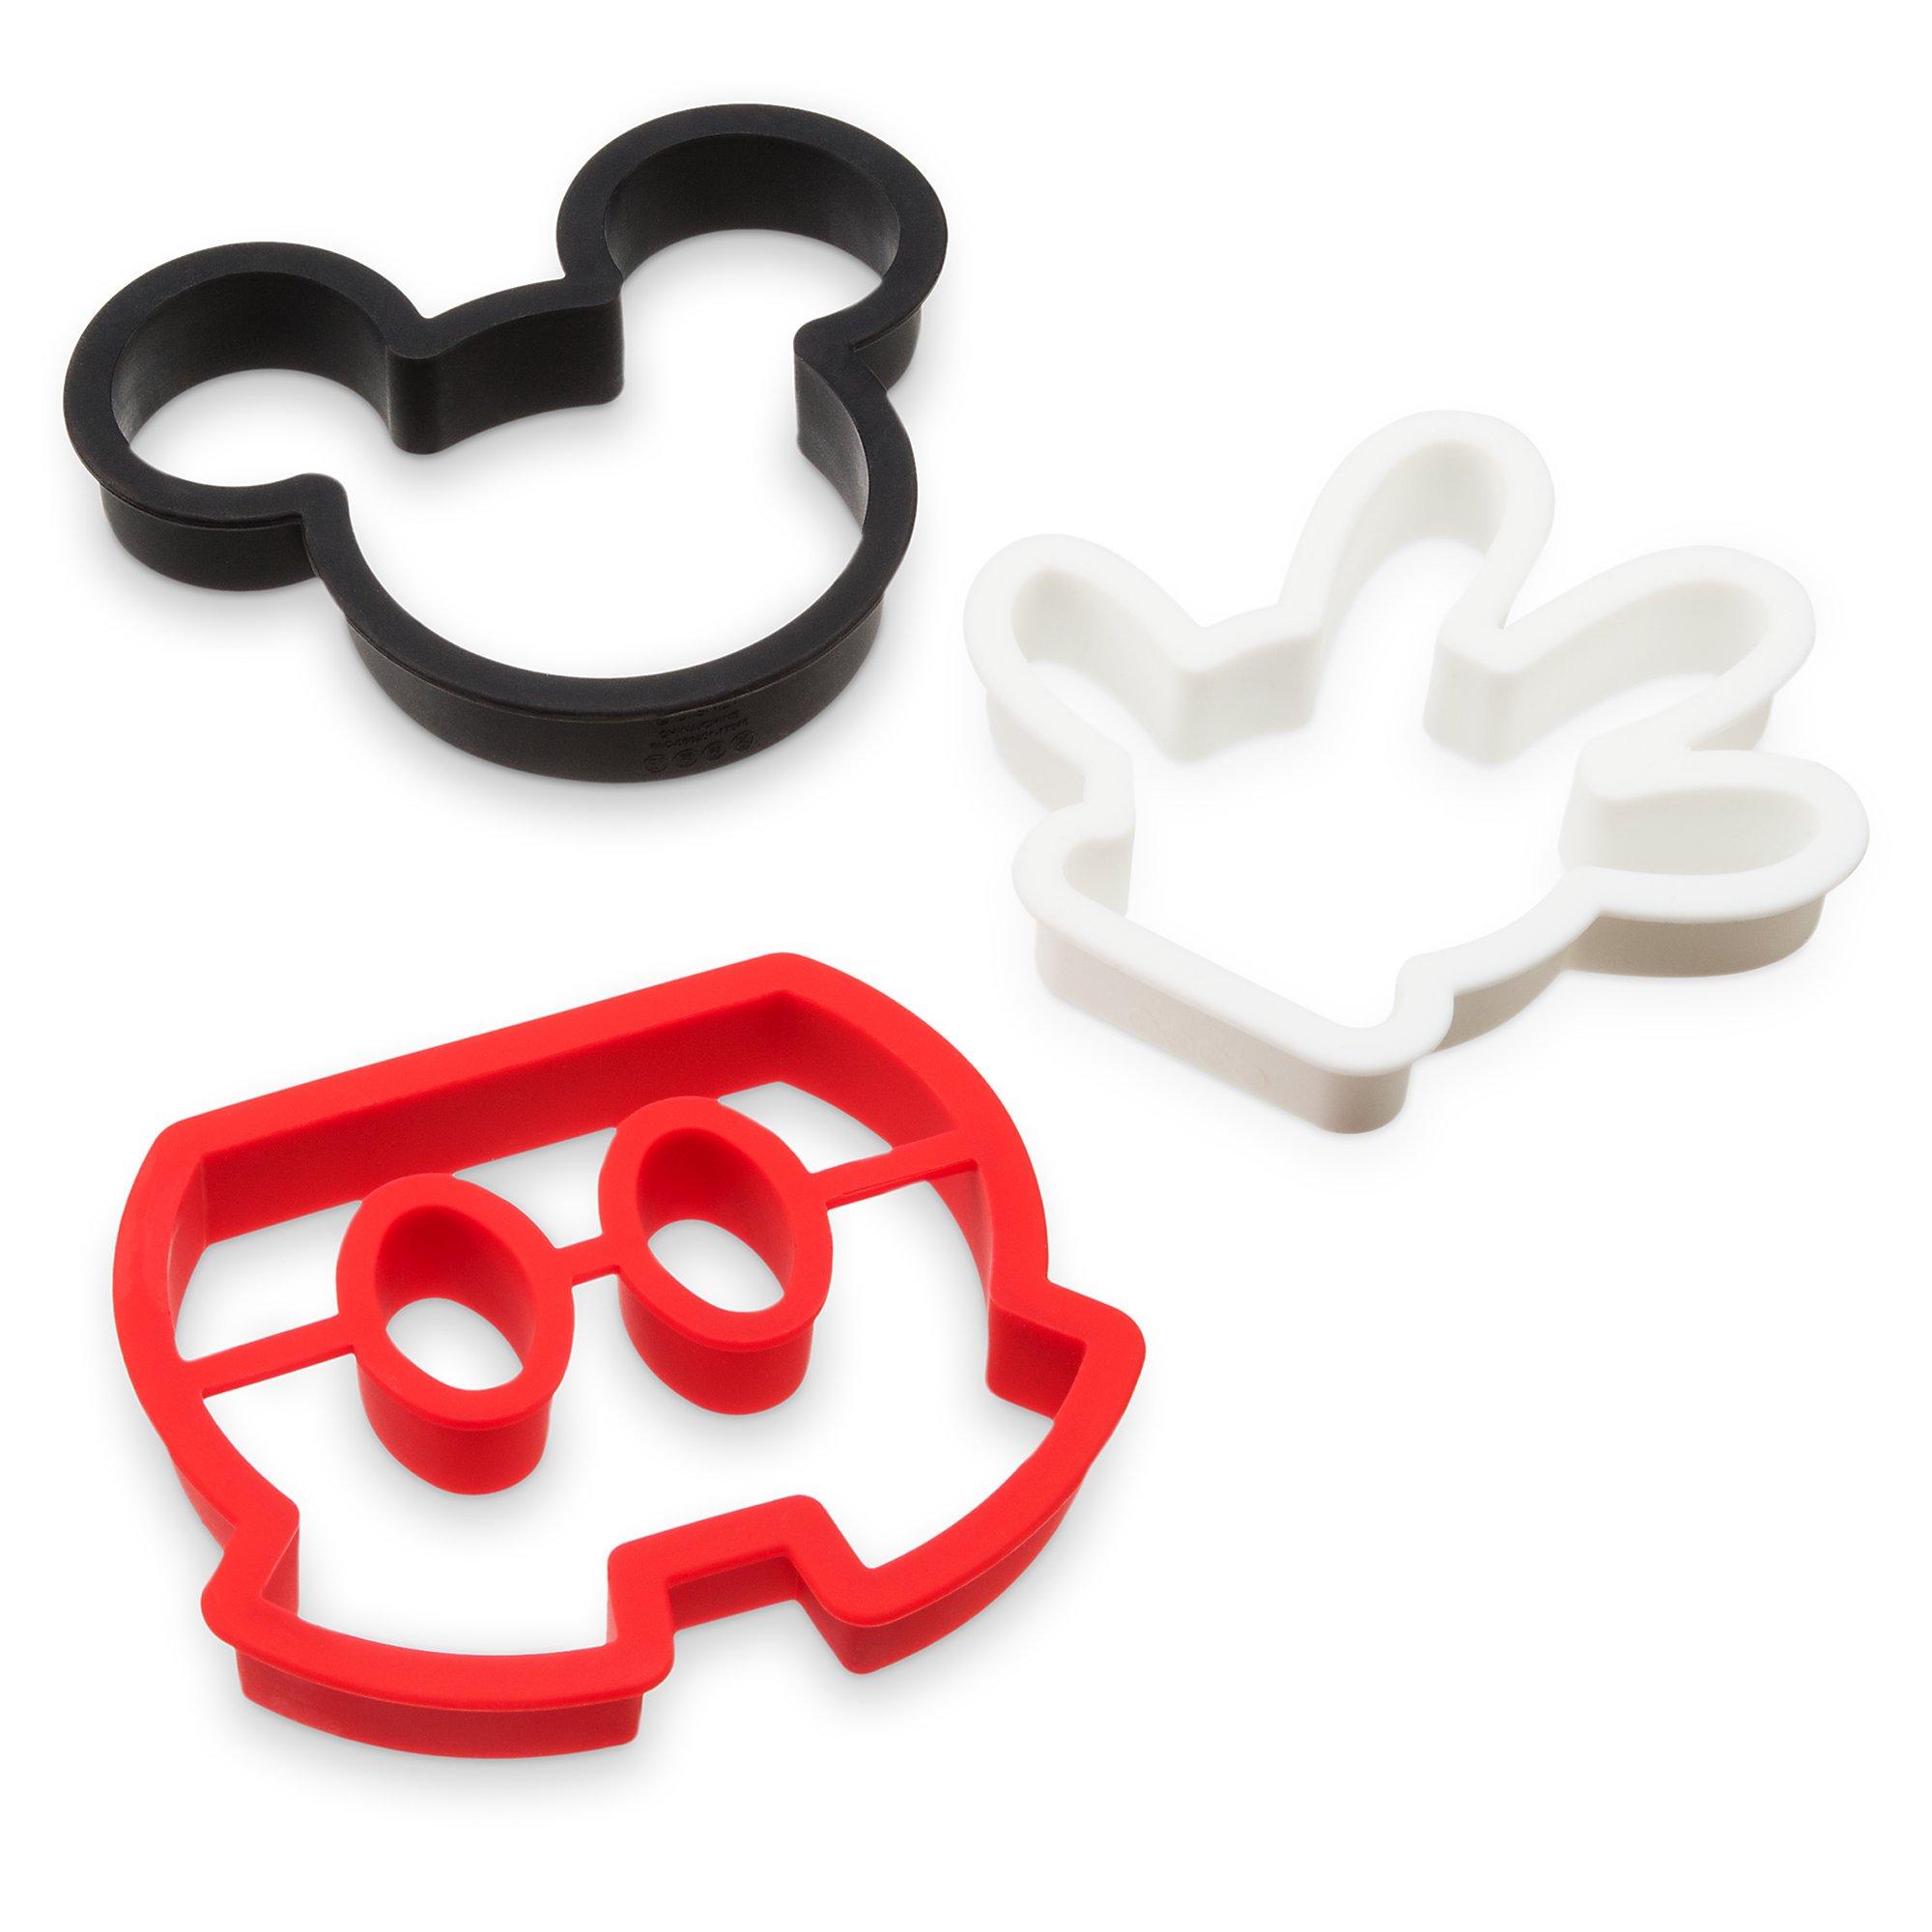 Mickey Mouse Silicone Breakfast Mold Set - Disney Eats